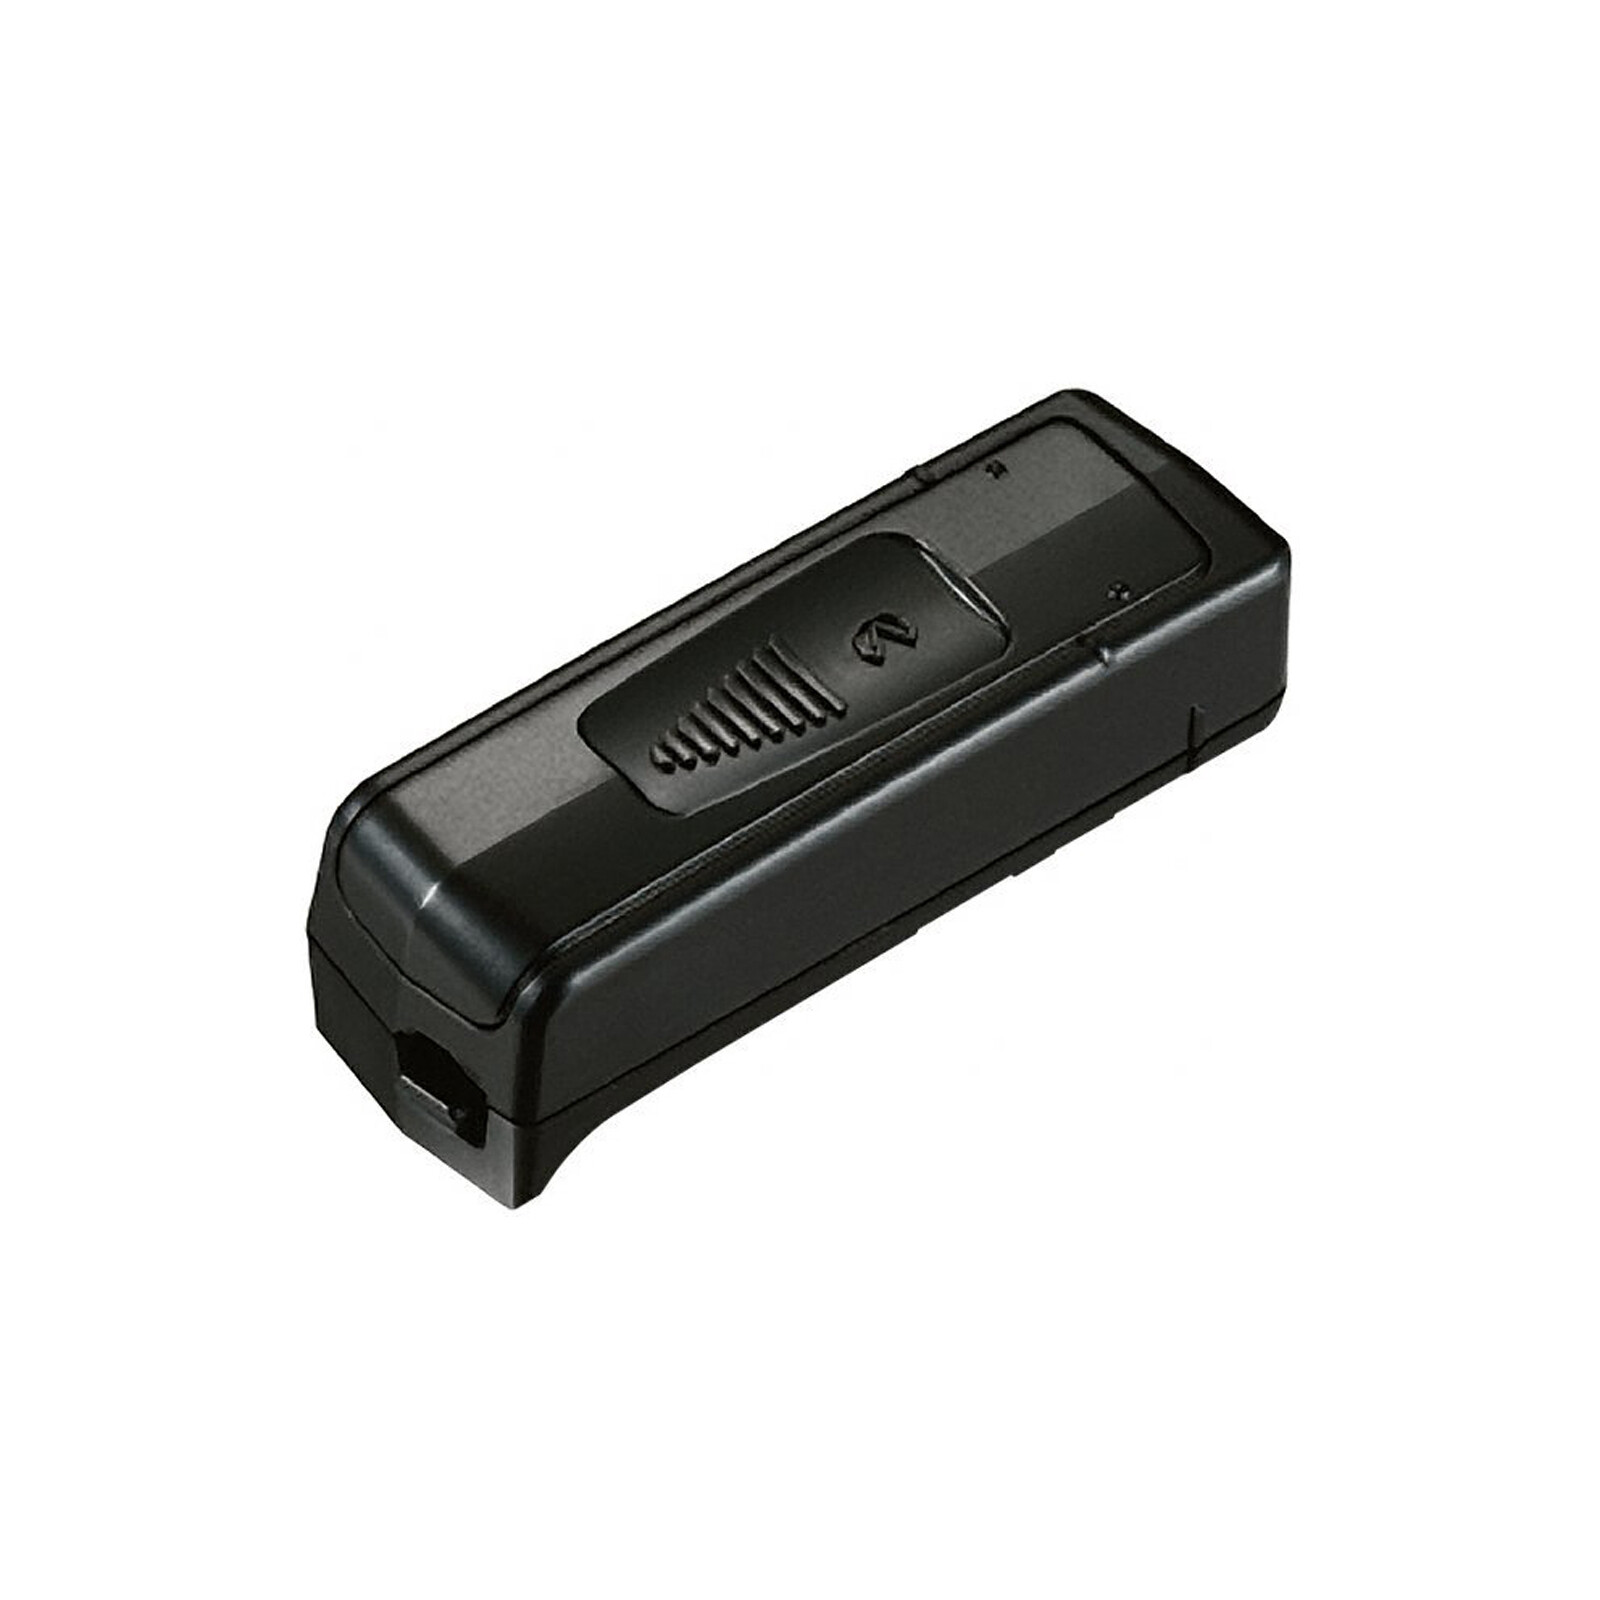 Nikon SD-800 Batterieteil